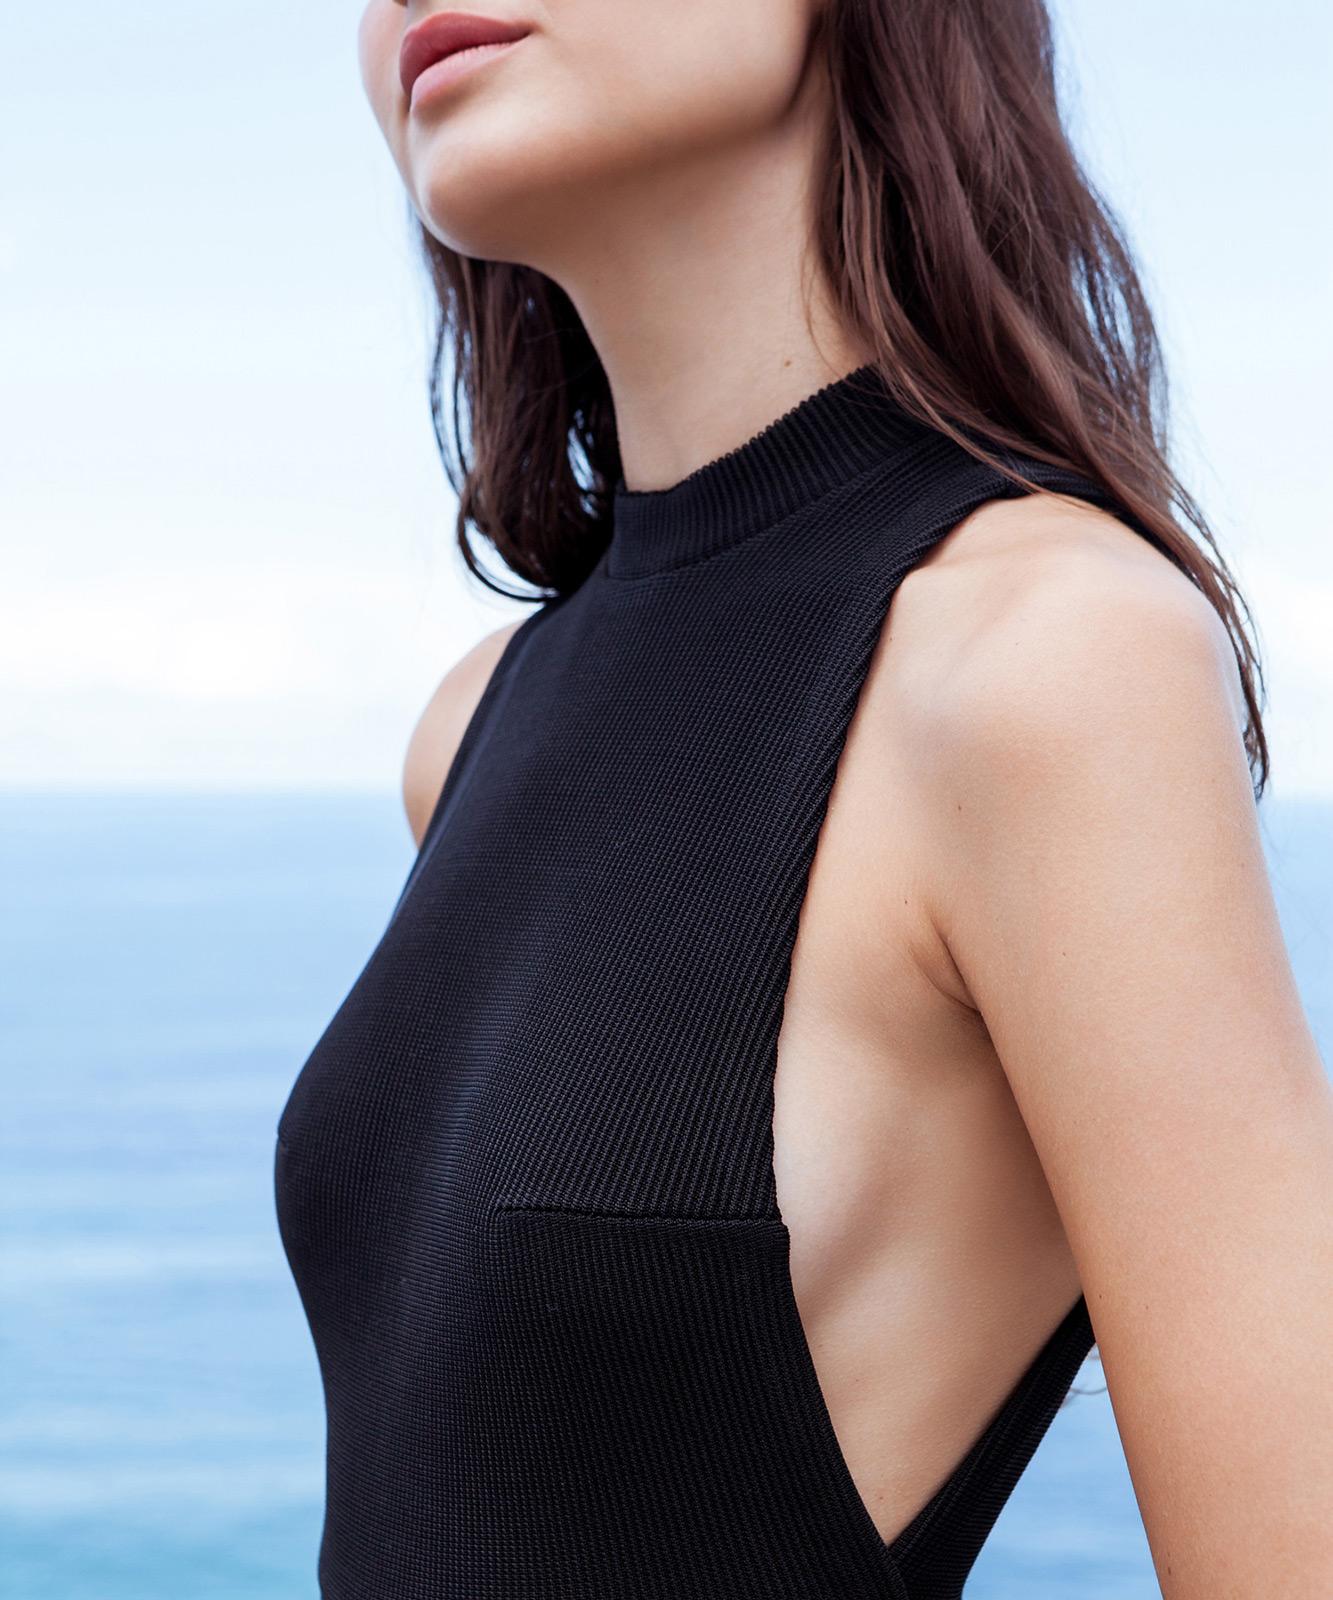 e918b570955ca ... Black tricot knit one-piece high-neck swimsuit - MAIÔ TRICOT KATE PRETO